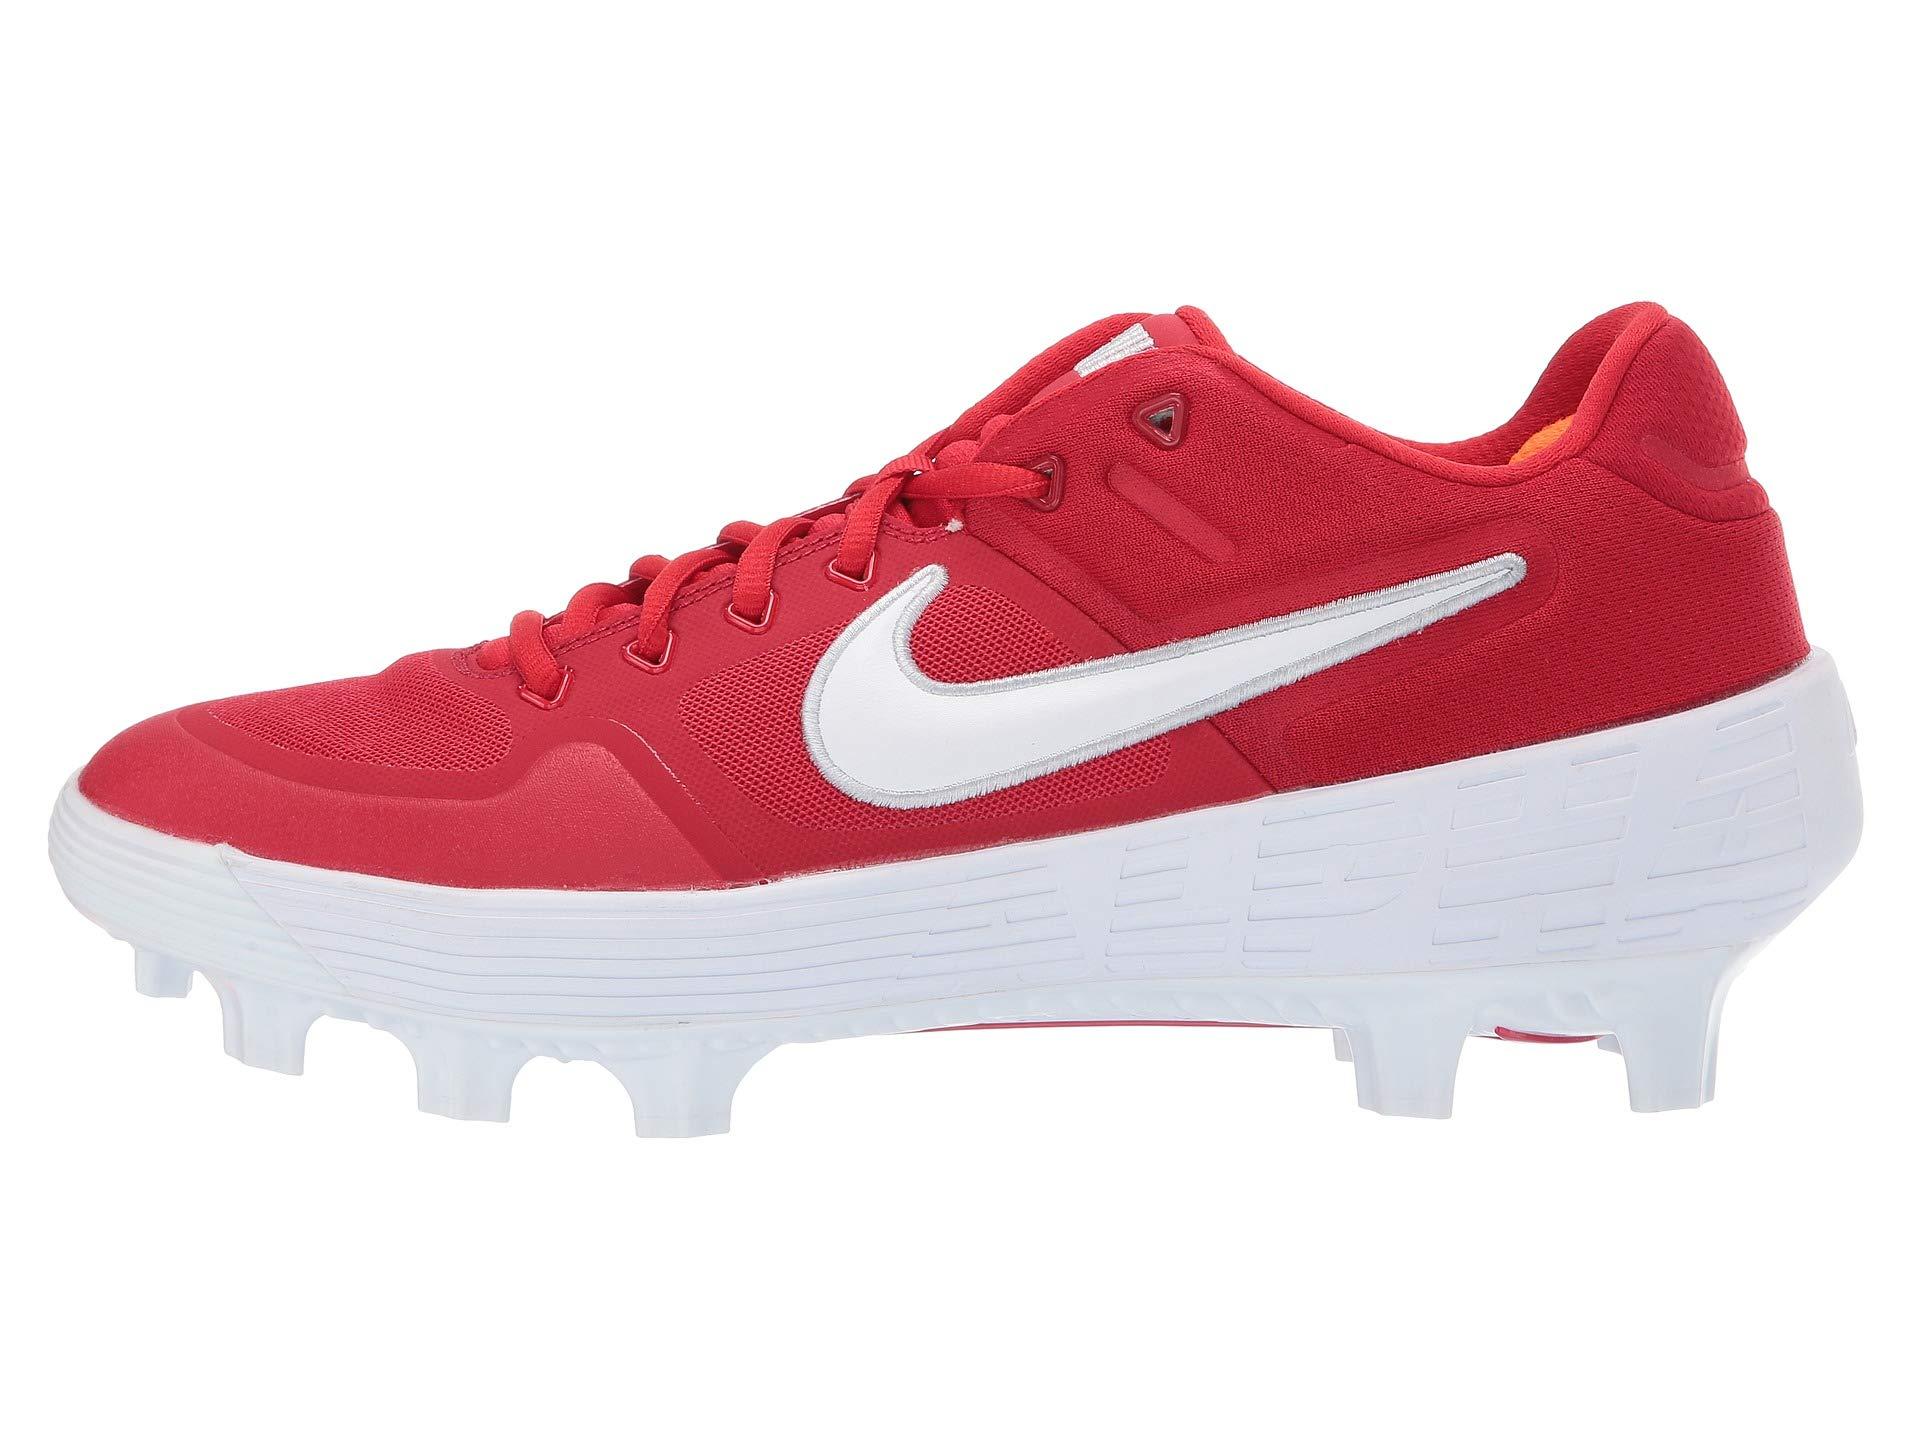 2 Red University Red Mcs Low white Huarache Alpha gym Elite Nike 4qnwxvtpC